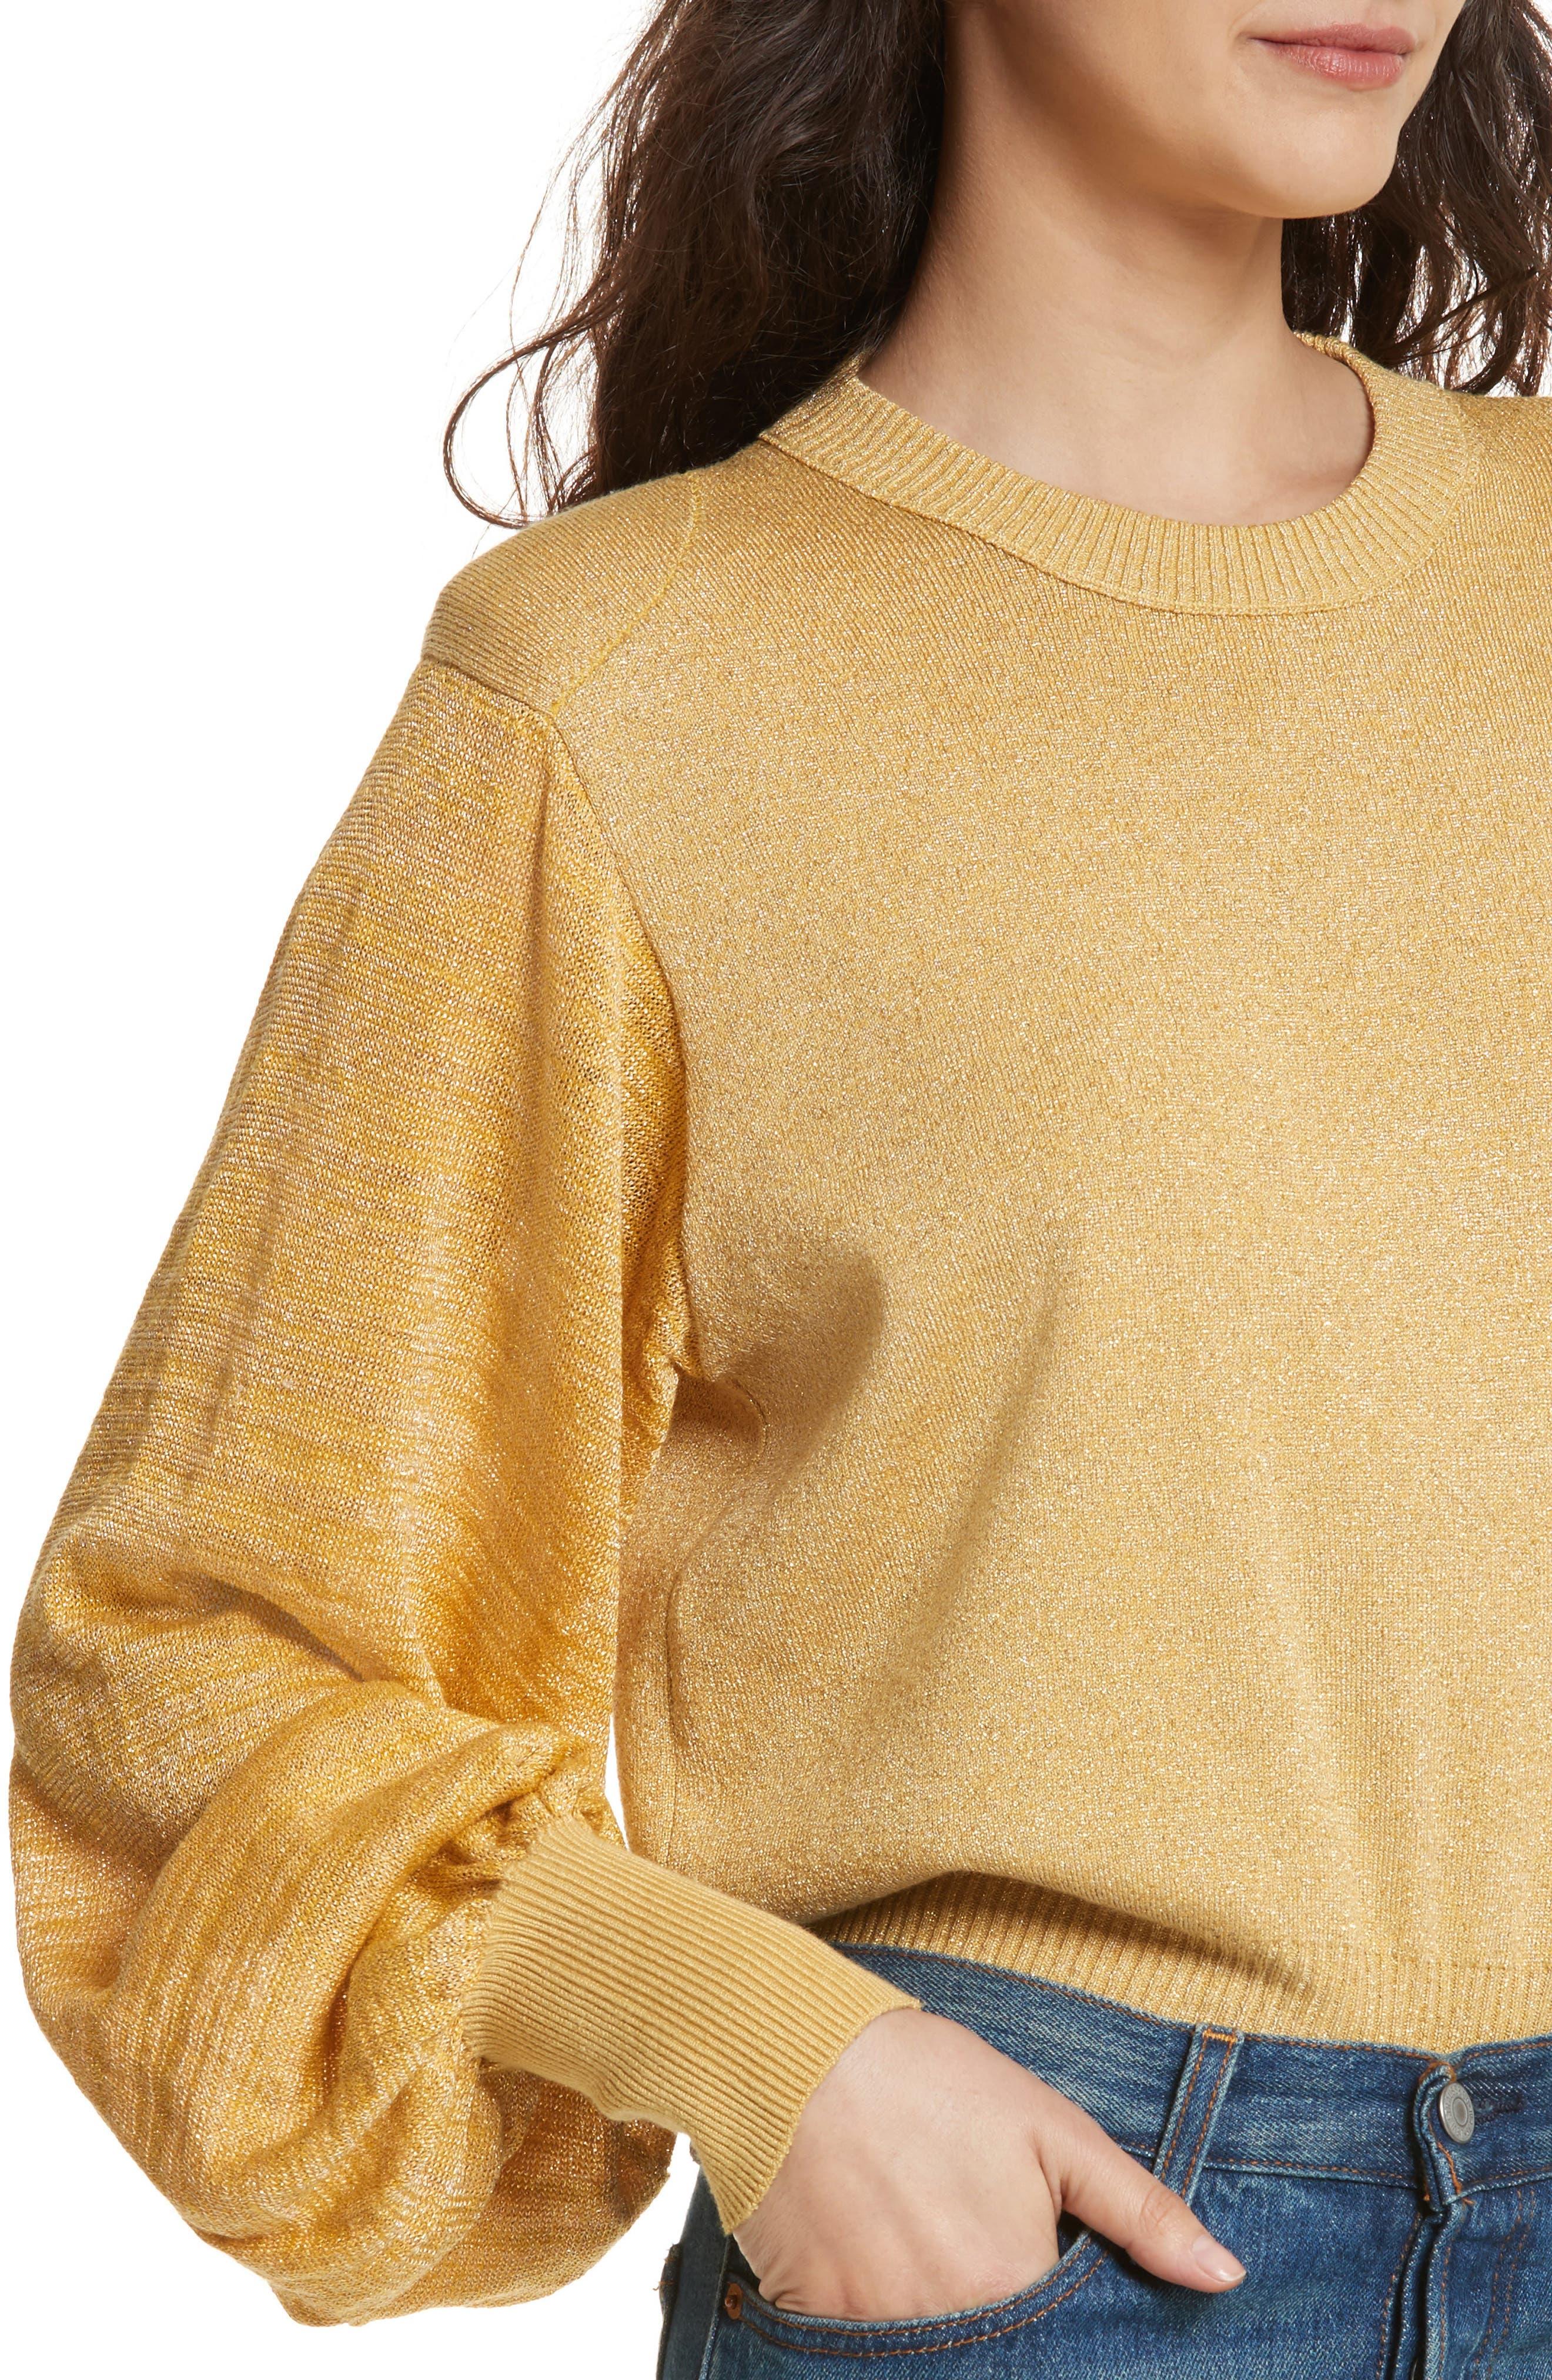 Let it Shine Sweater,                             Alternate thumbnail 11, color,